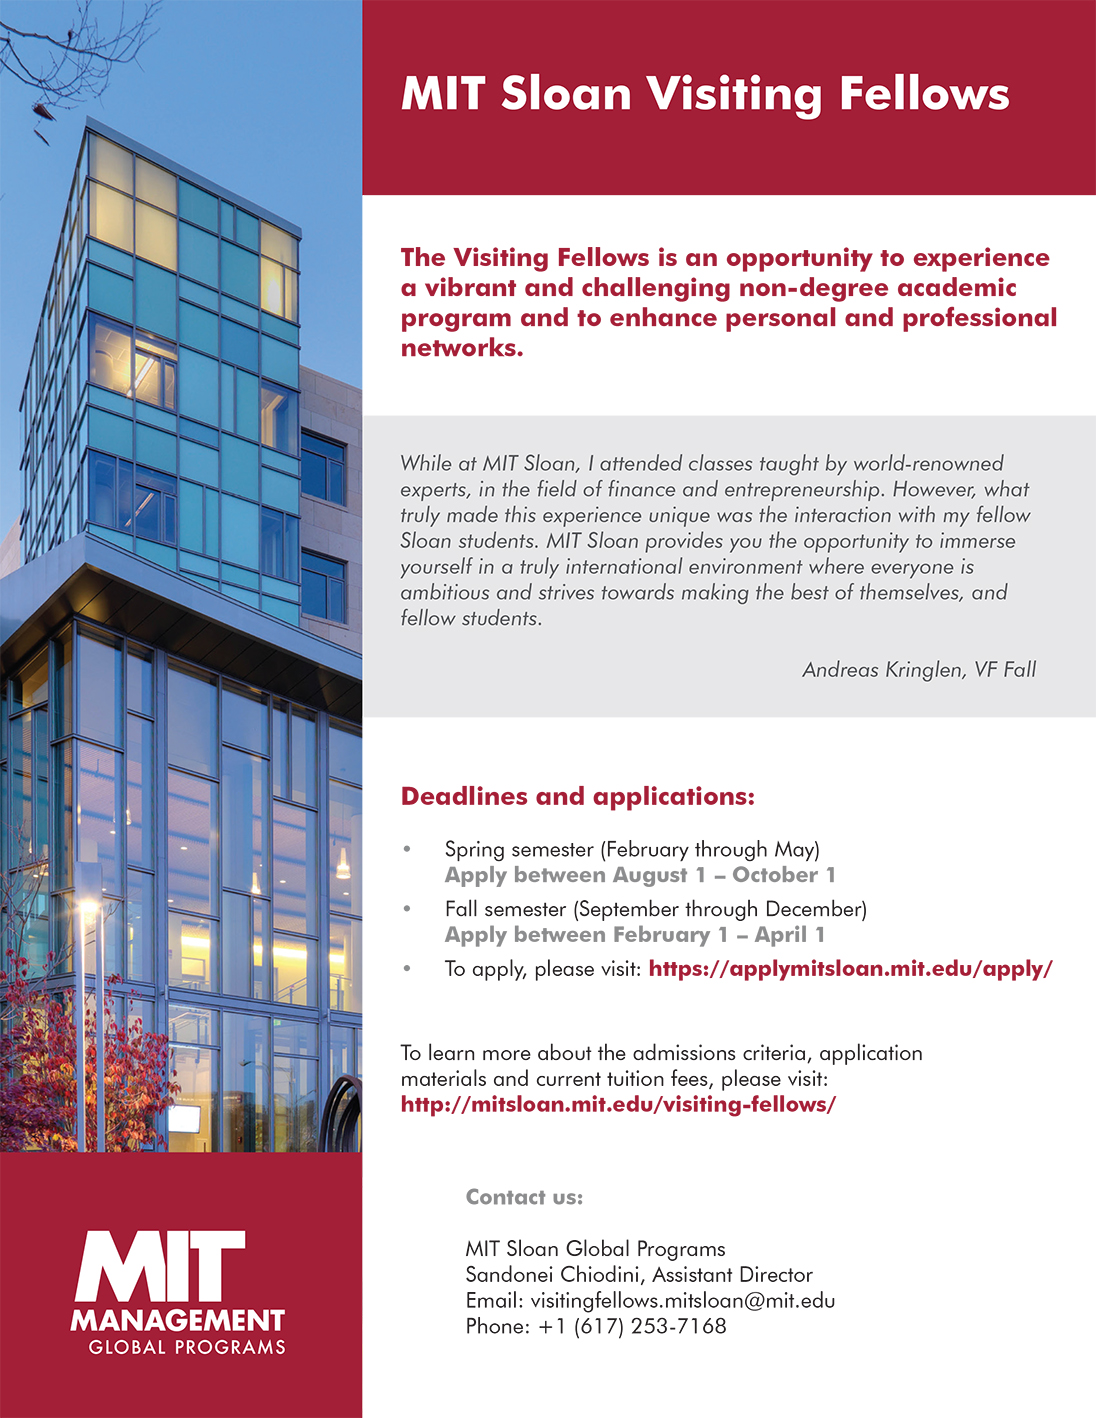 MIT Sloan Visiting Fellows Handout